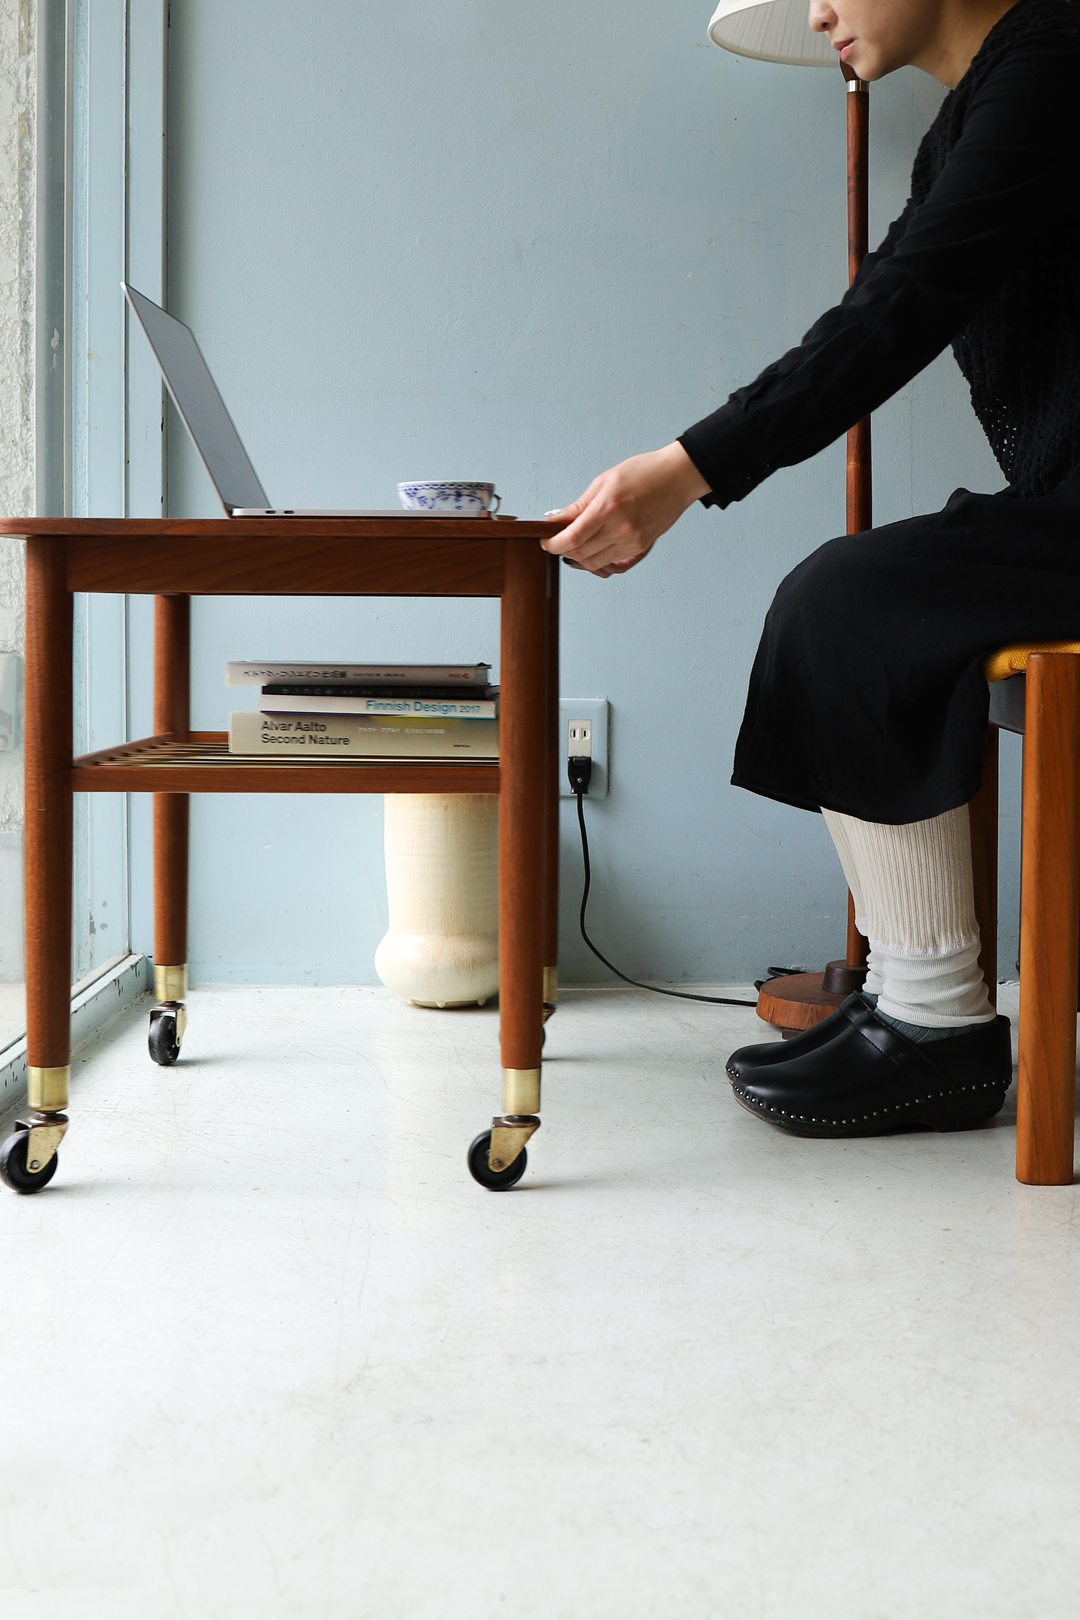 Danish Vintage Teakwood Wagon Table/デンマークヴィンテージ ワゴンテーブル サイドテーブル キャスター付き チーク材 北欧家具